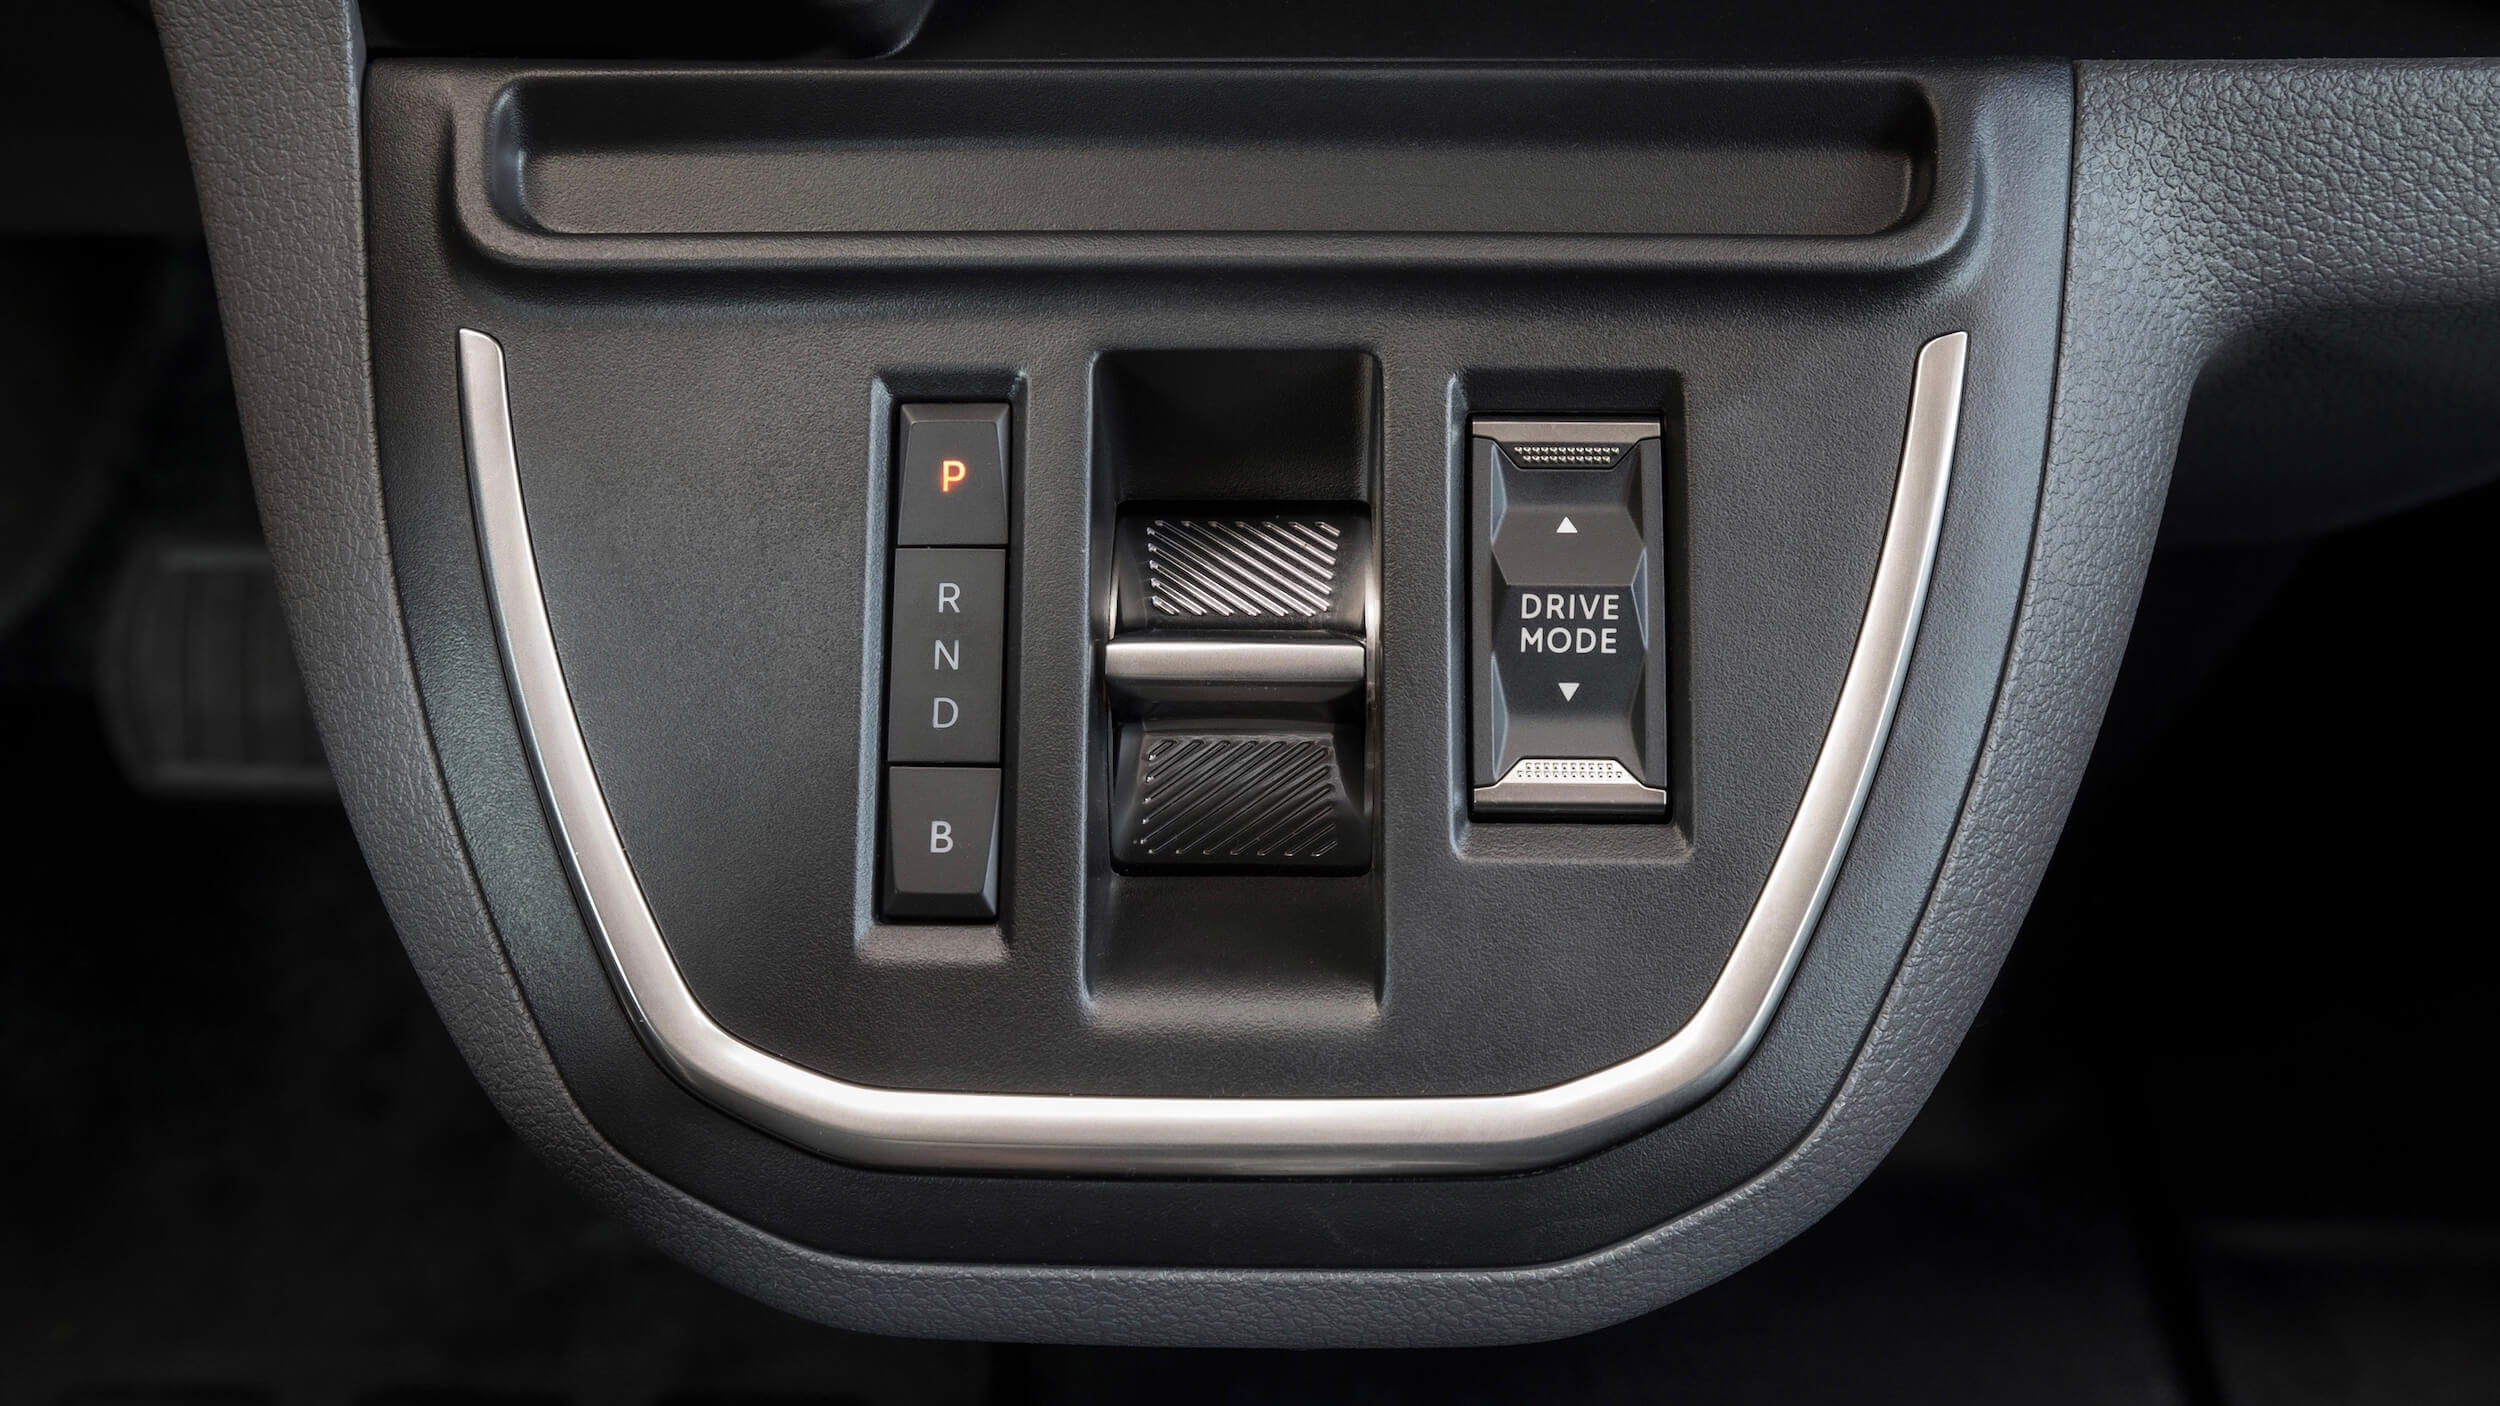 Elektrische Opel Zafira drive selector